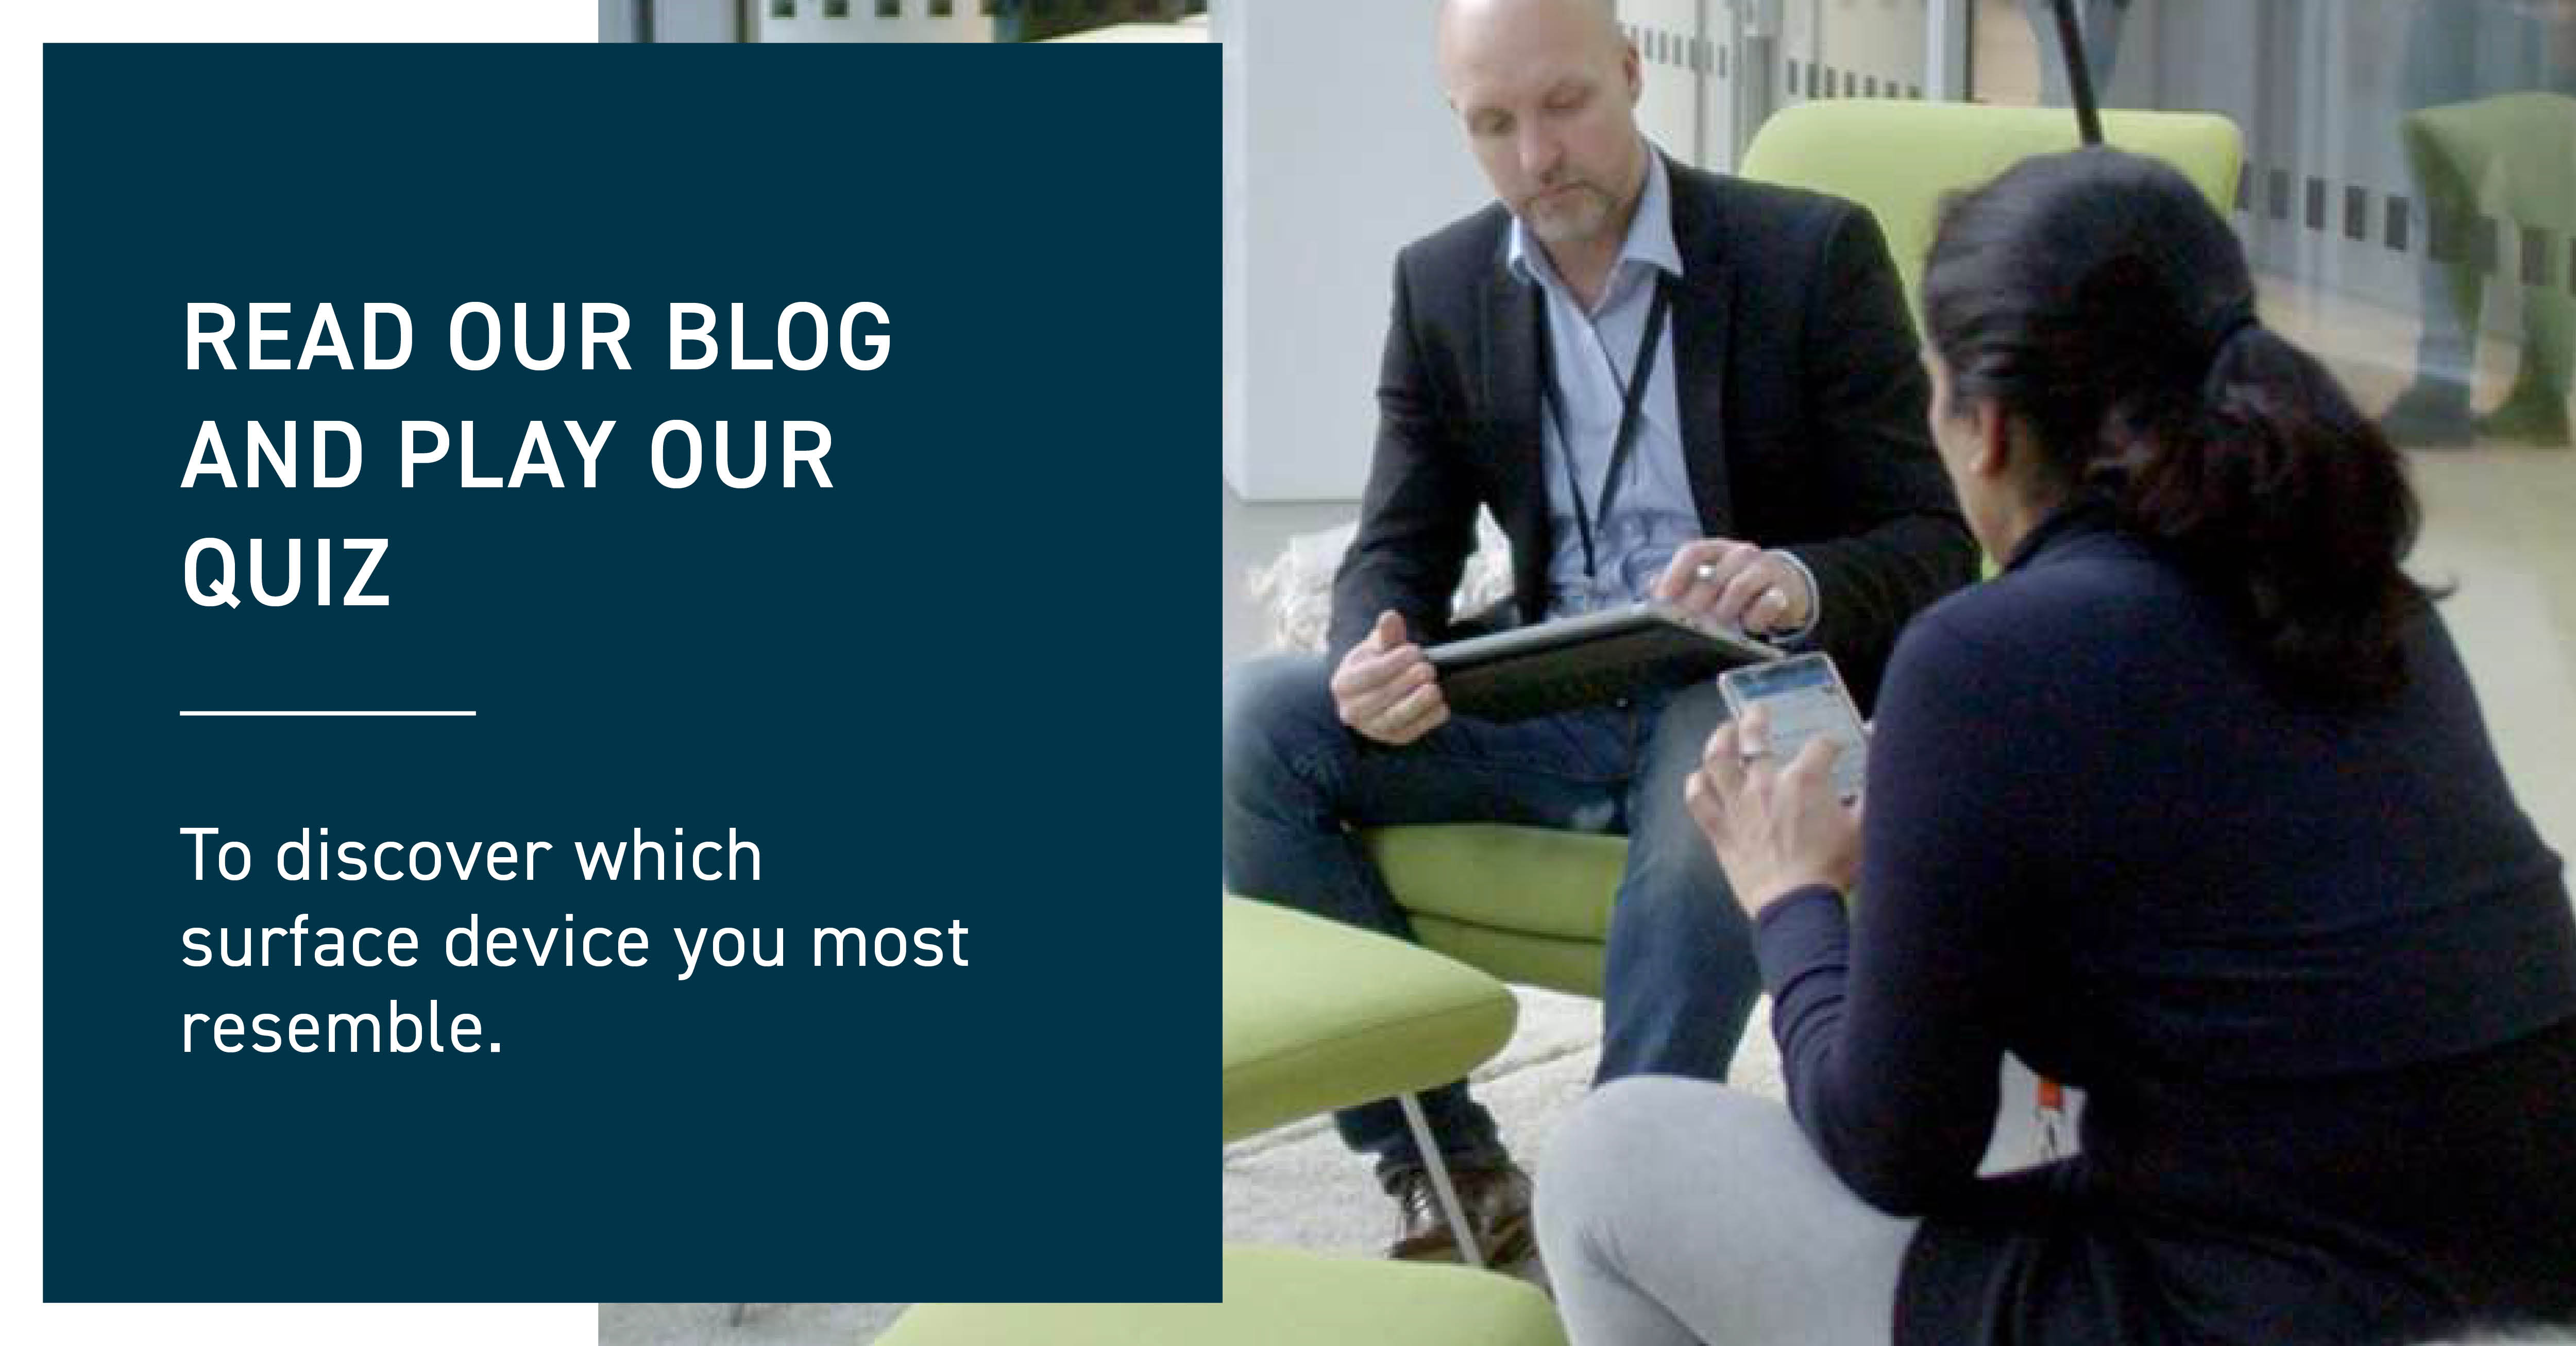 LinkedIn 10 - 4th blog